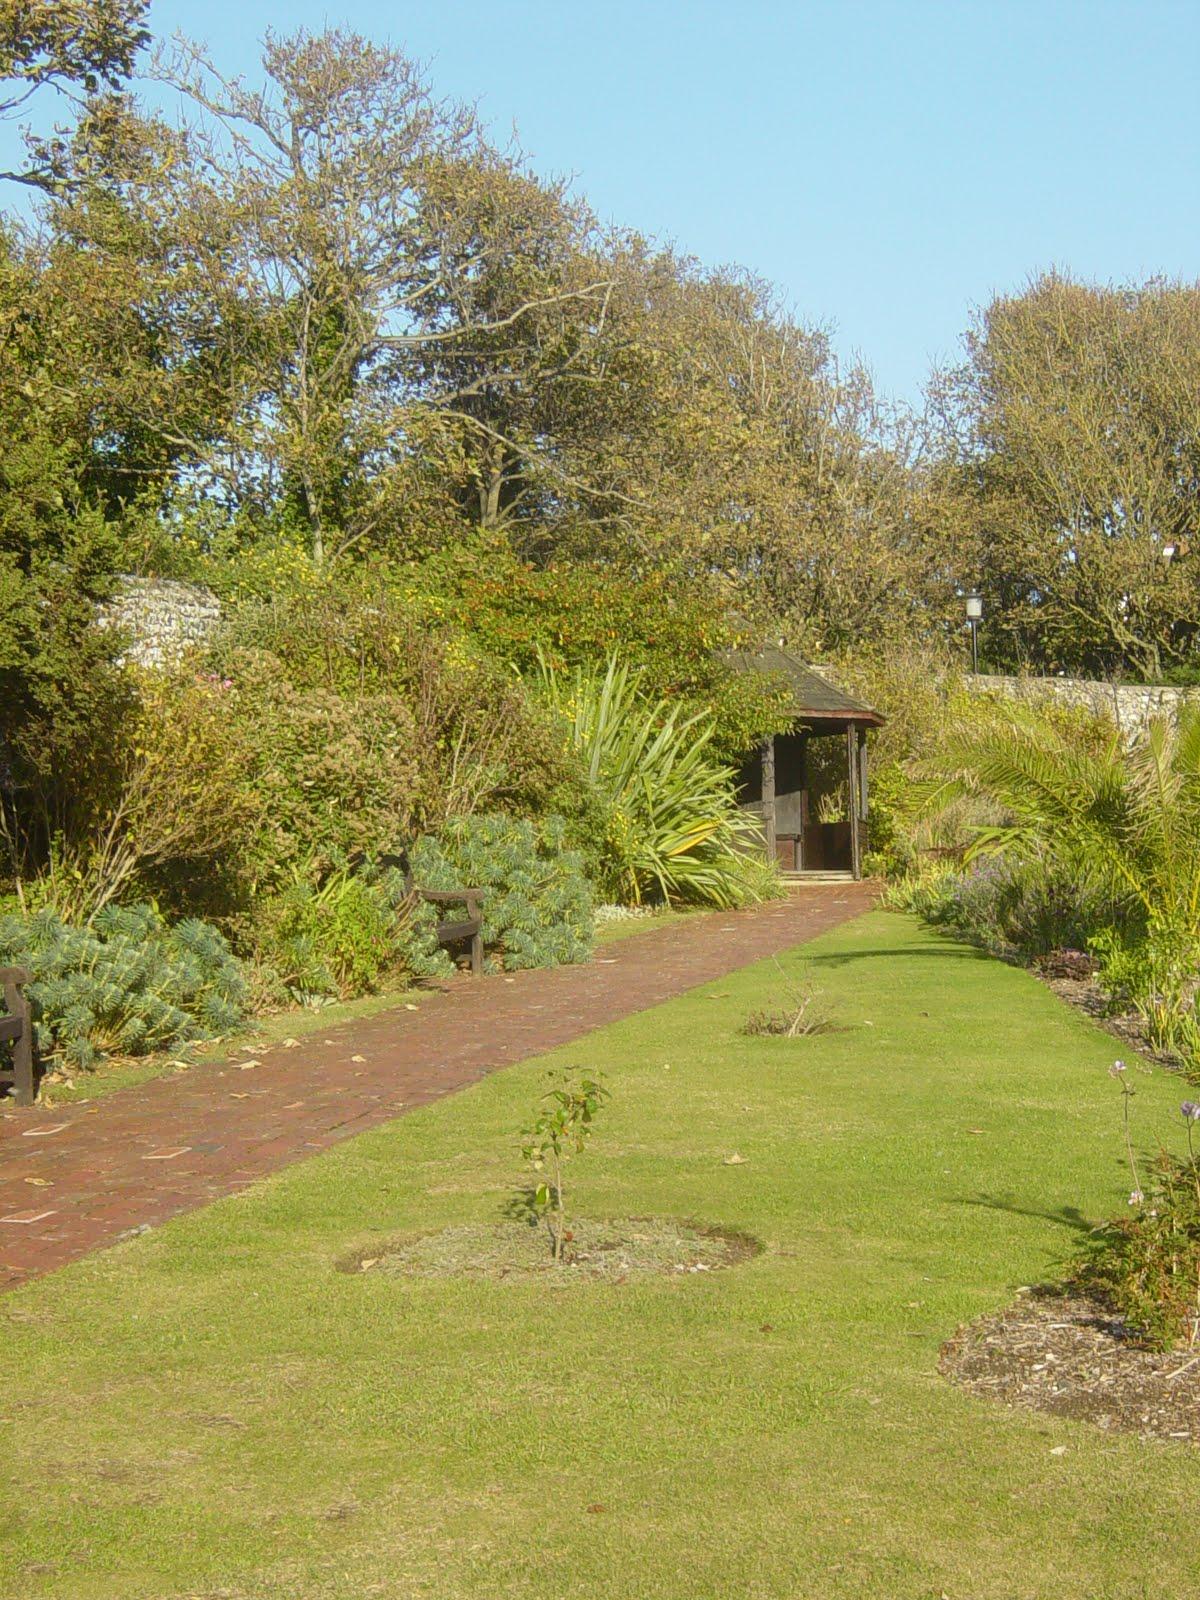 A garden tour kipling 39 s garden rottingdean for Jardin kennedy